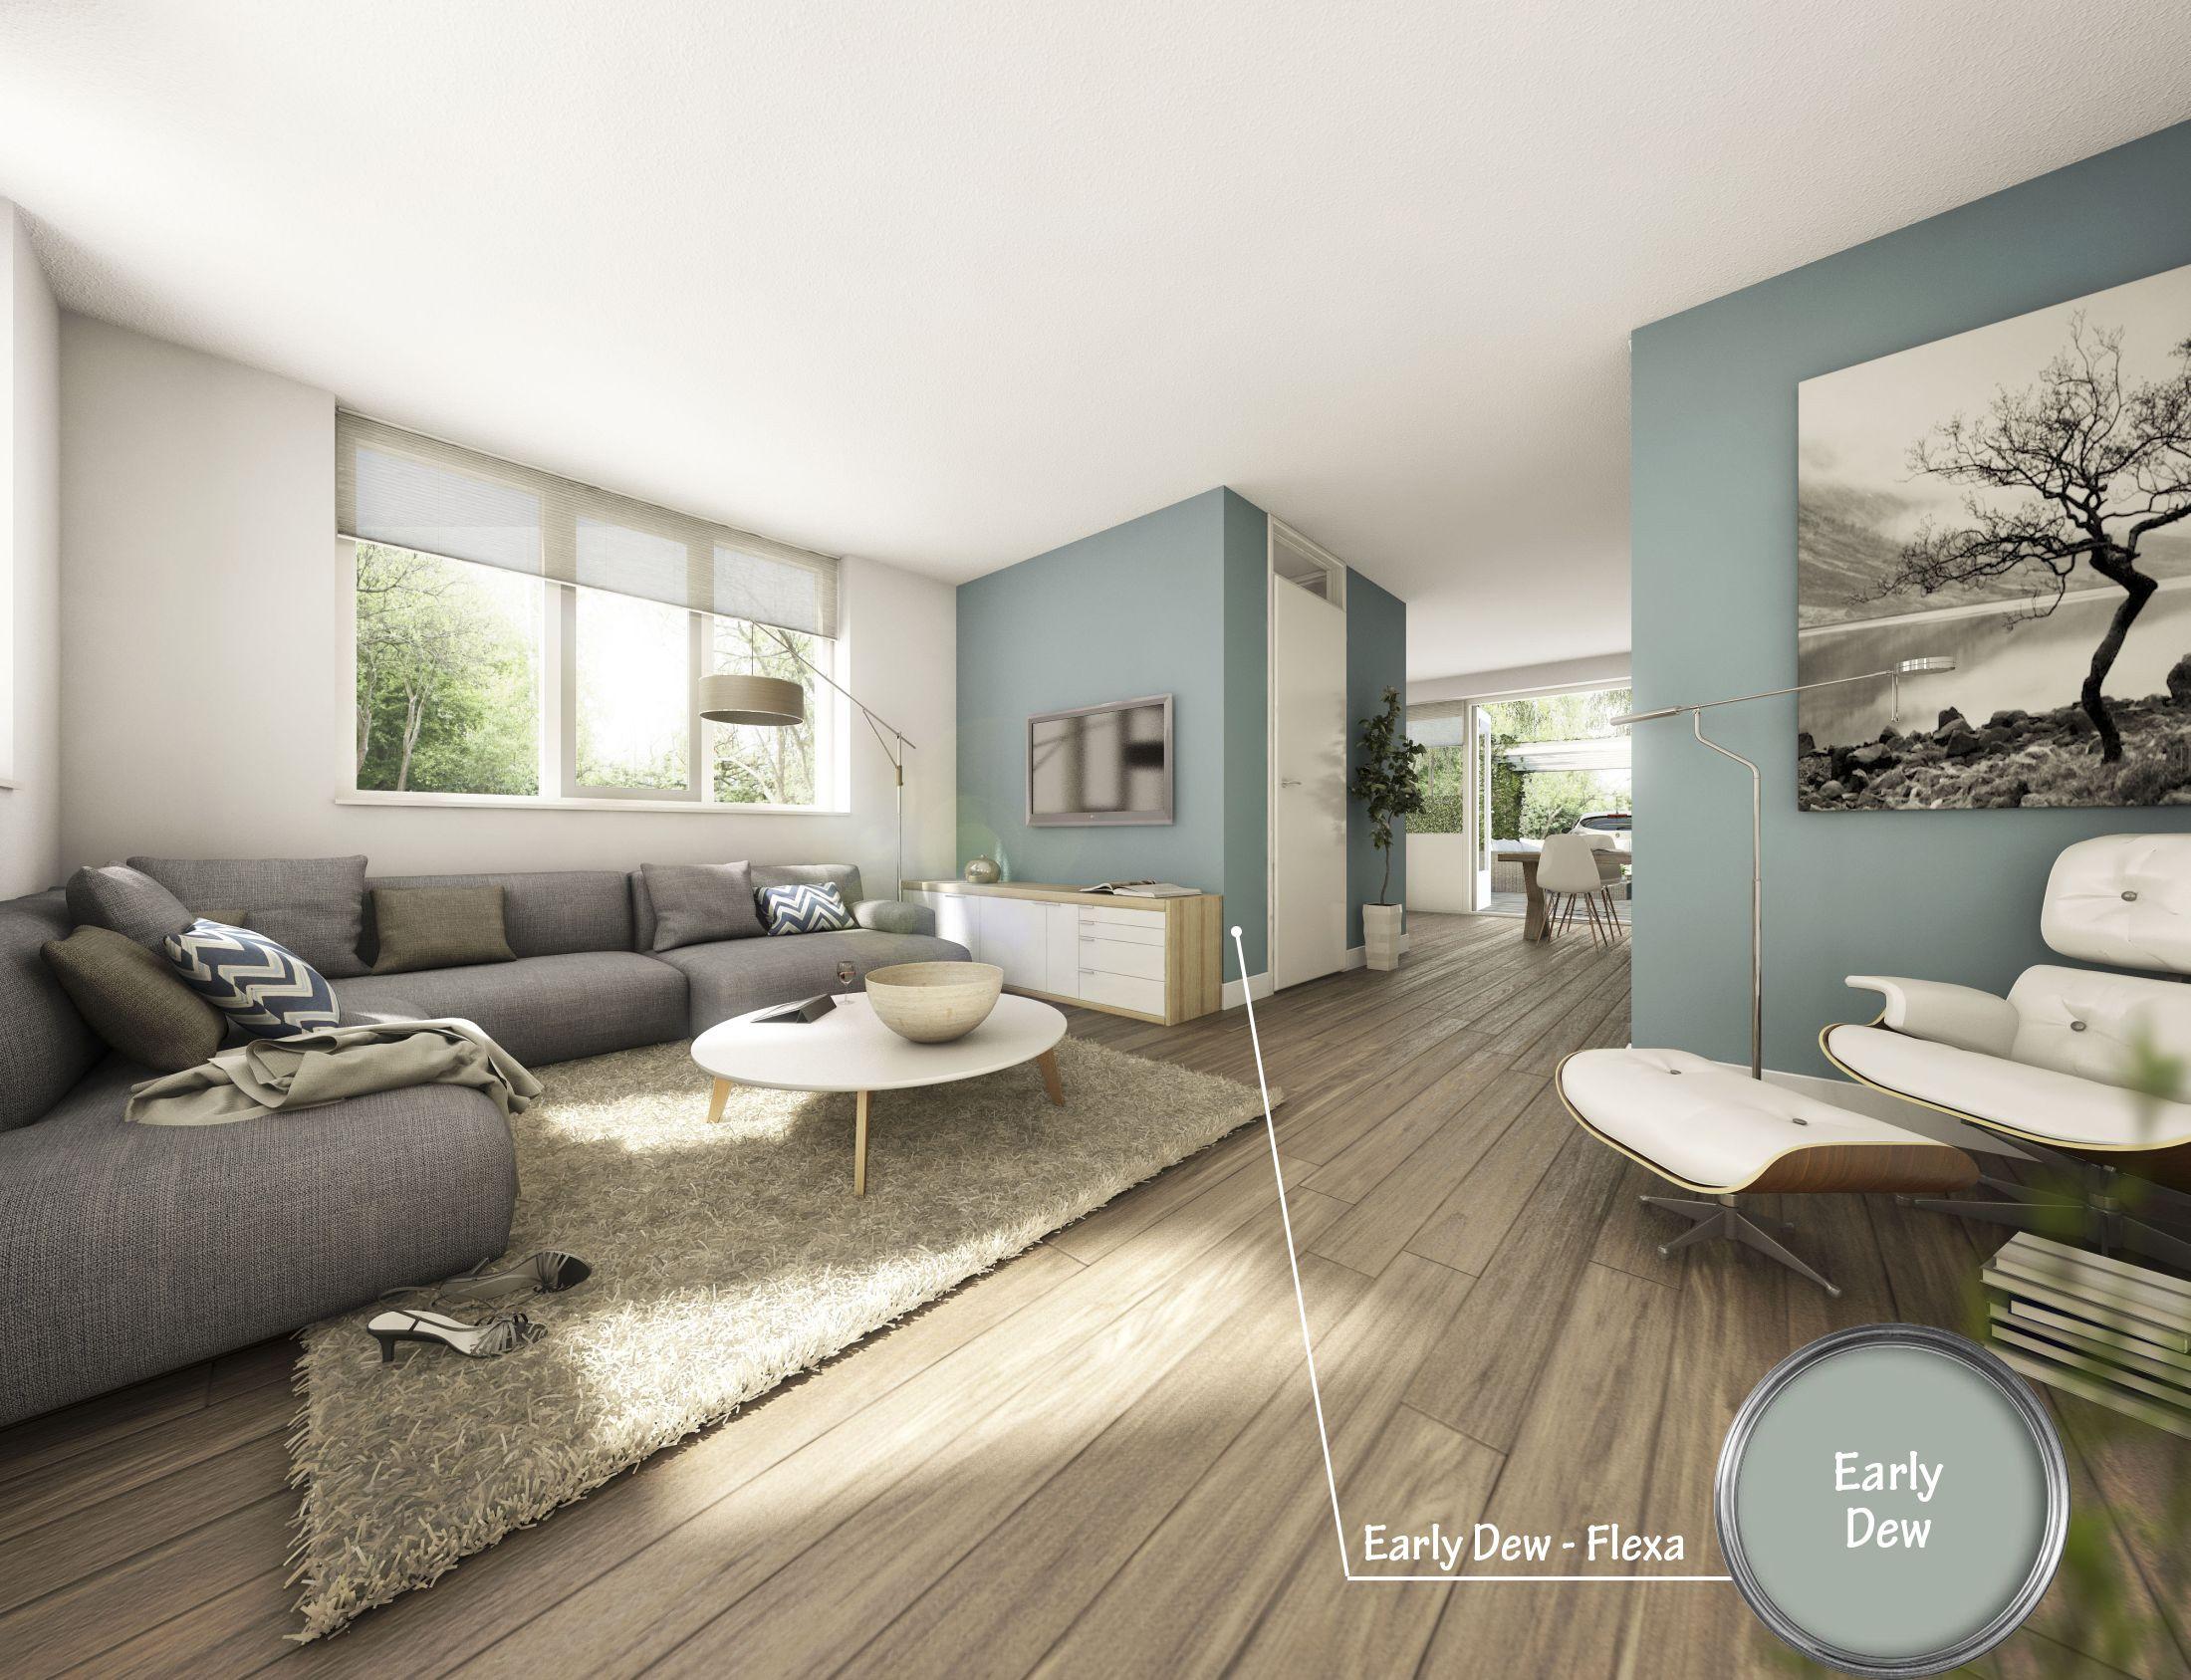 frisse woonkamer met prachtige kleur: early dew van flexa | huis, Deco ideeën